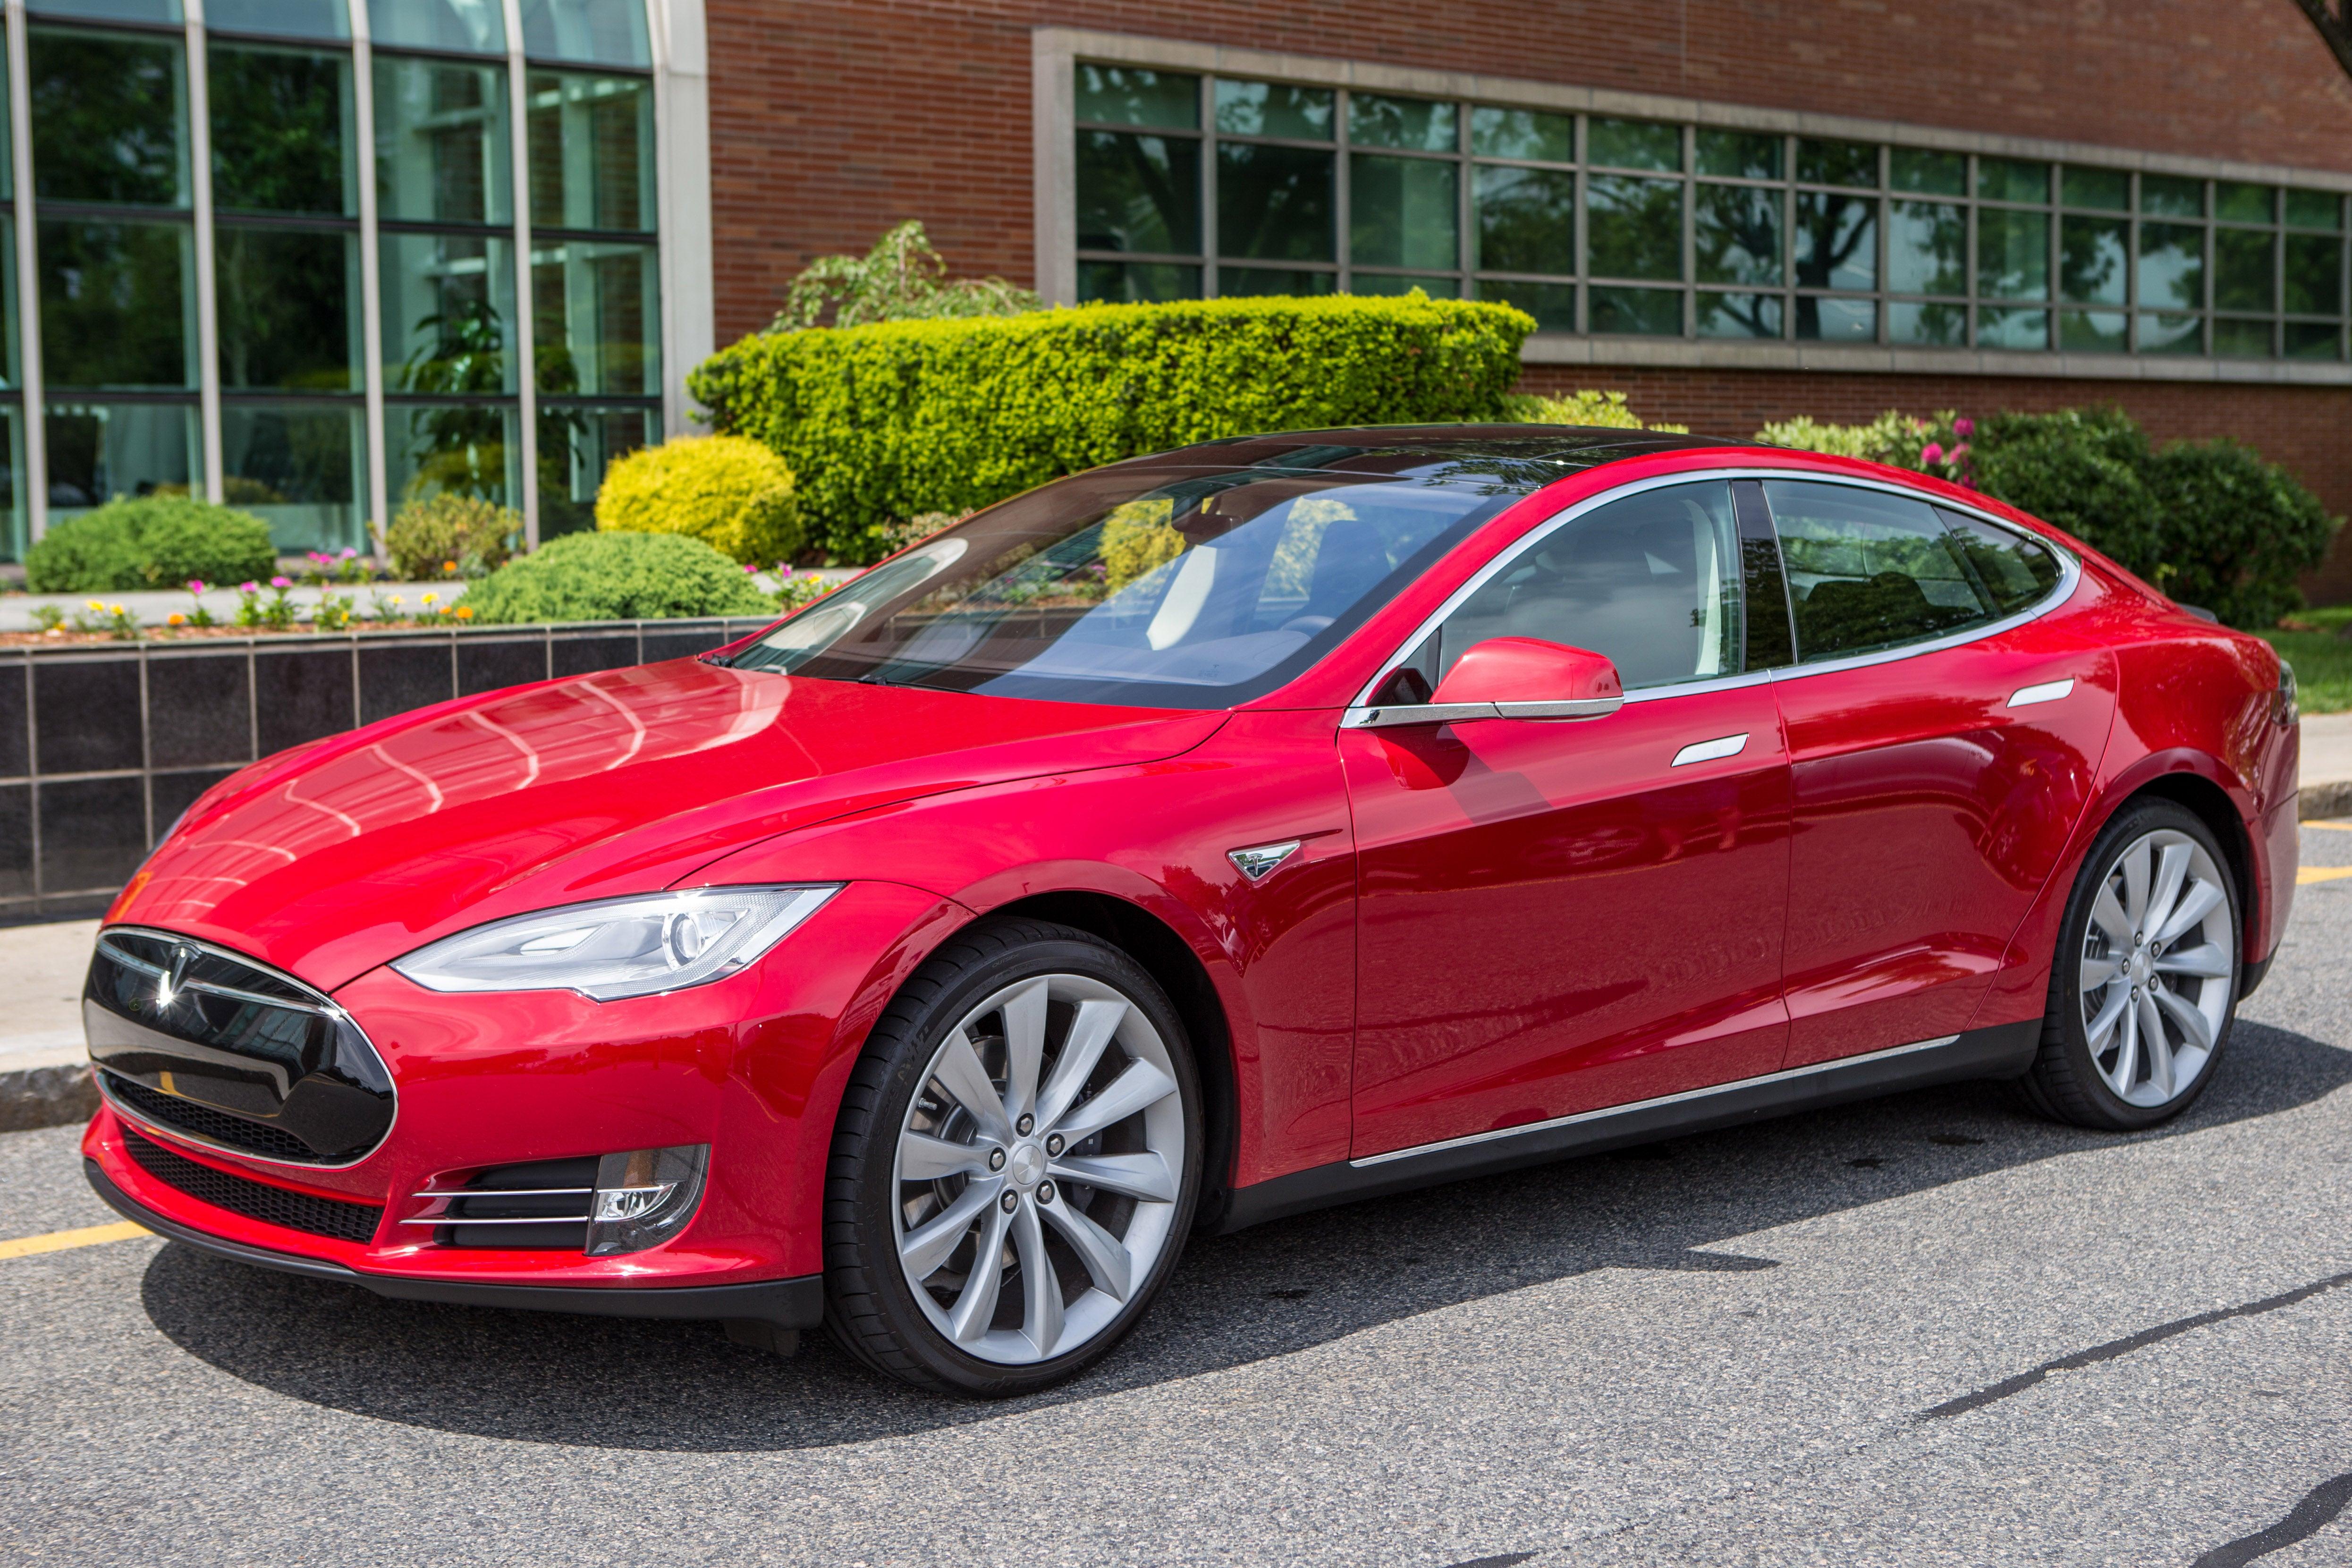 Tesla Model S. Model years: 2012-13, 2015.